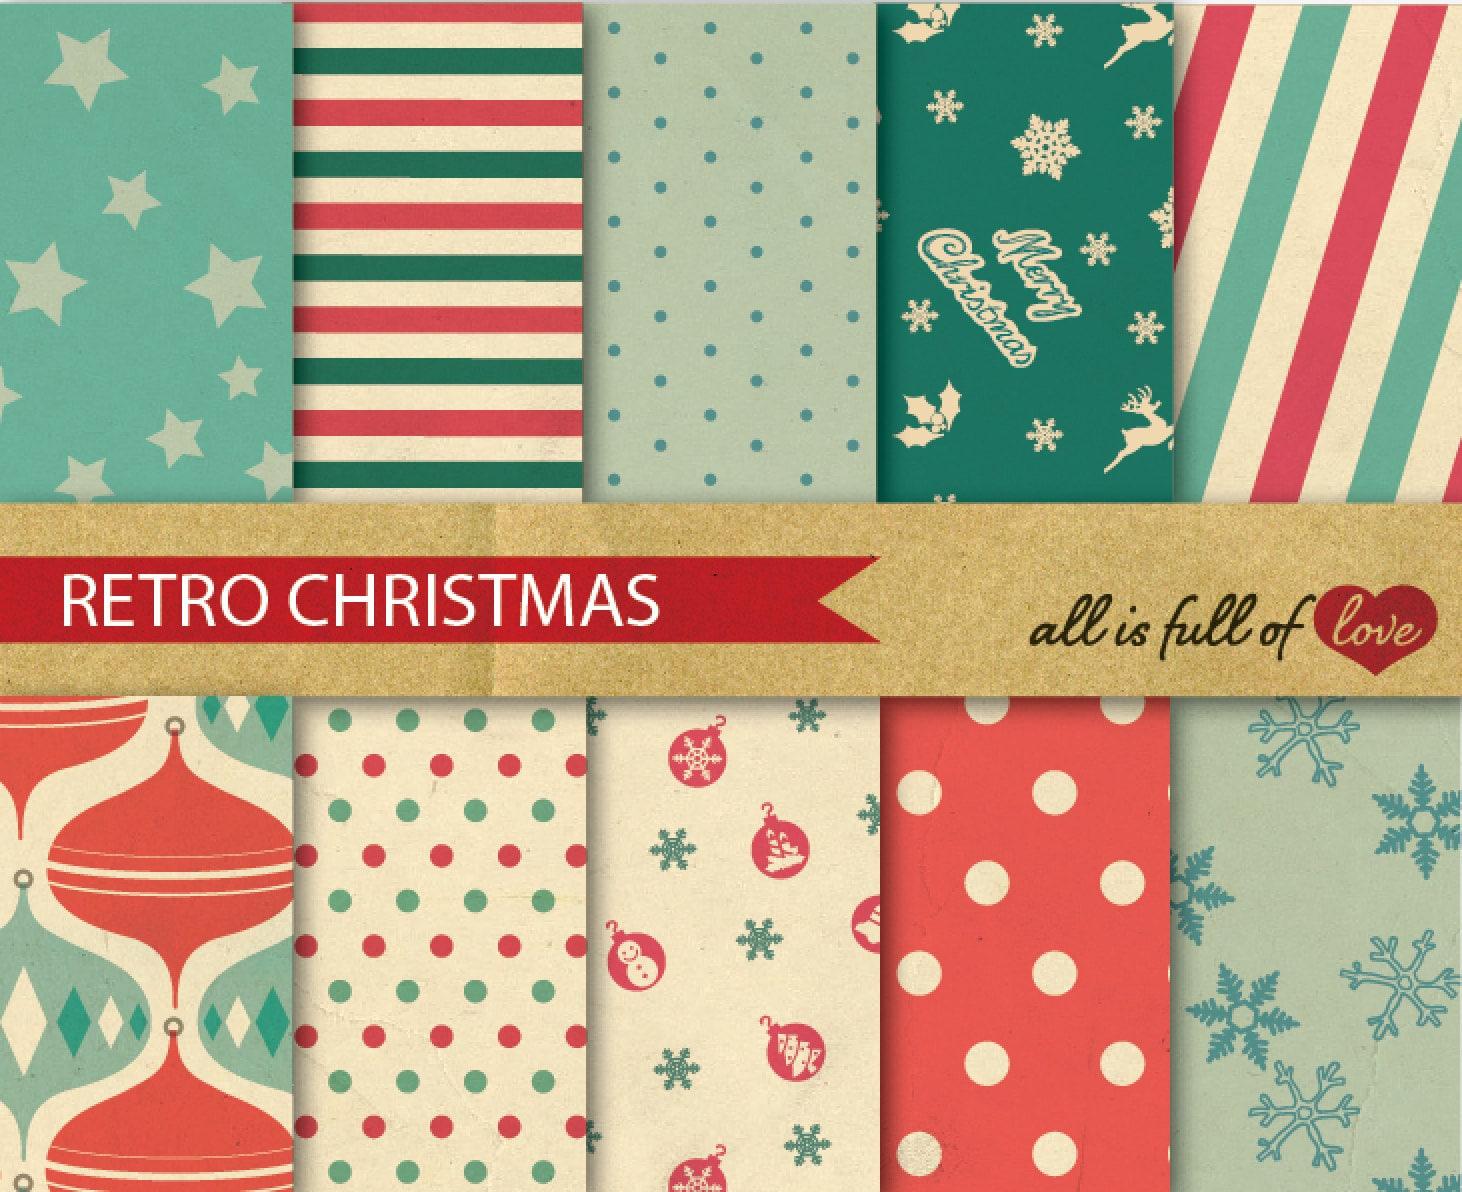 Printable paper backgrounds christmas - Christmas Vintage Printable Paper Pack Digital Scrapbook Patterns